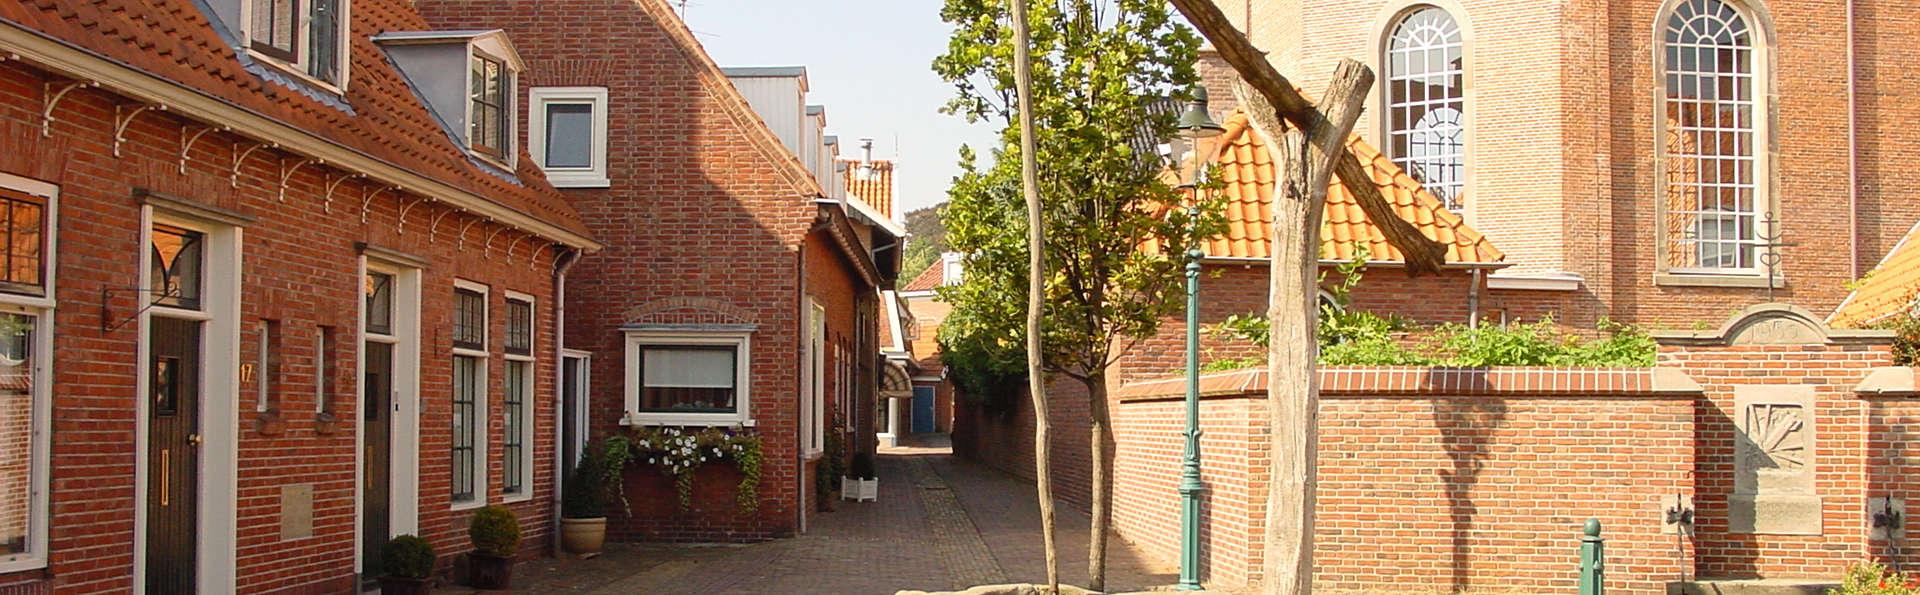 Parkhotel de Wiemsel - EDIT_Ootmarsum-waterput-met-haalboom-01.jpg